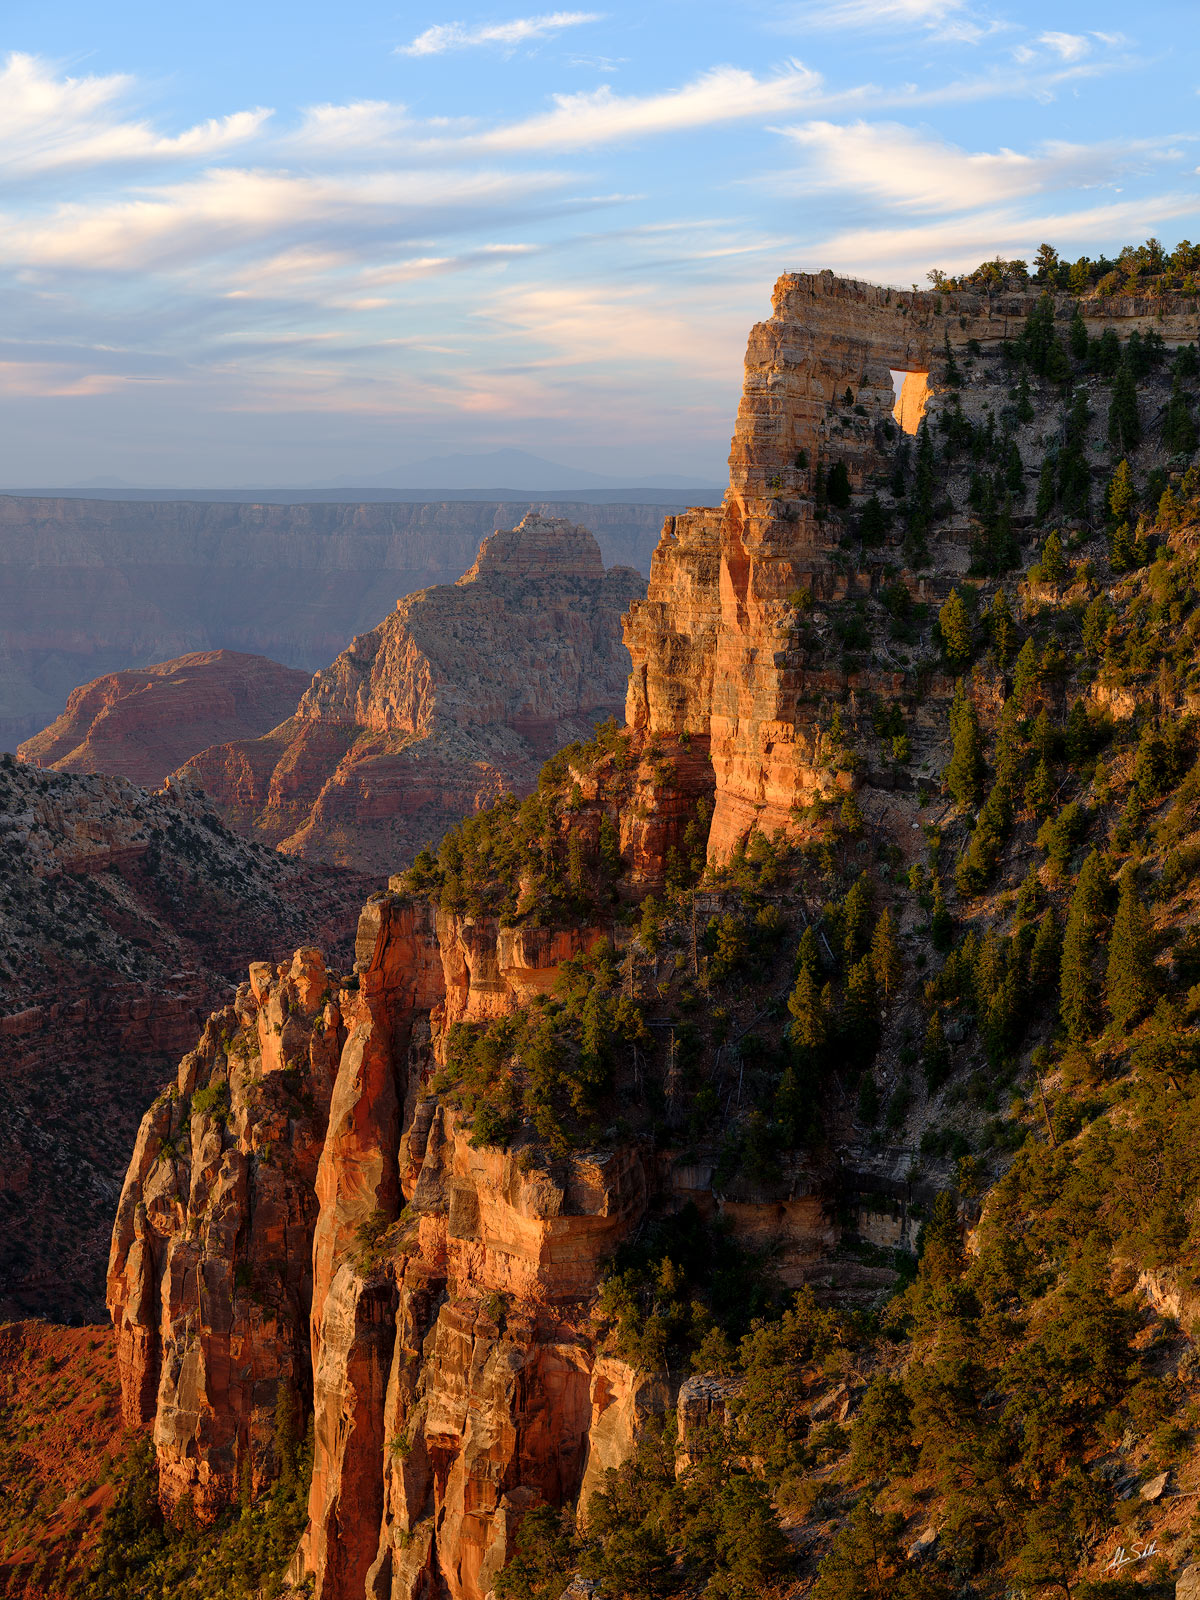 AZ, Angels Window, Arizona, Fuji, Fujifilm, GFX 50R, Grand Canyon, National Park, North Rim, Sunrise, photo